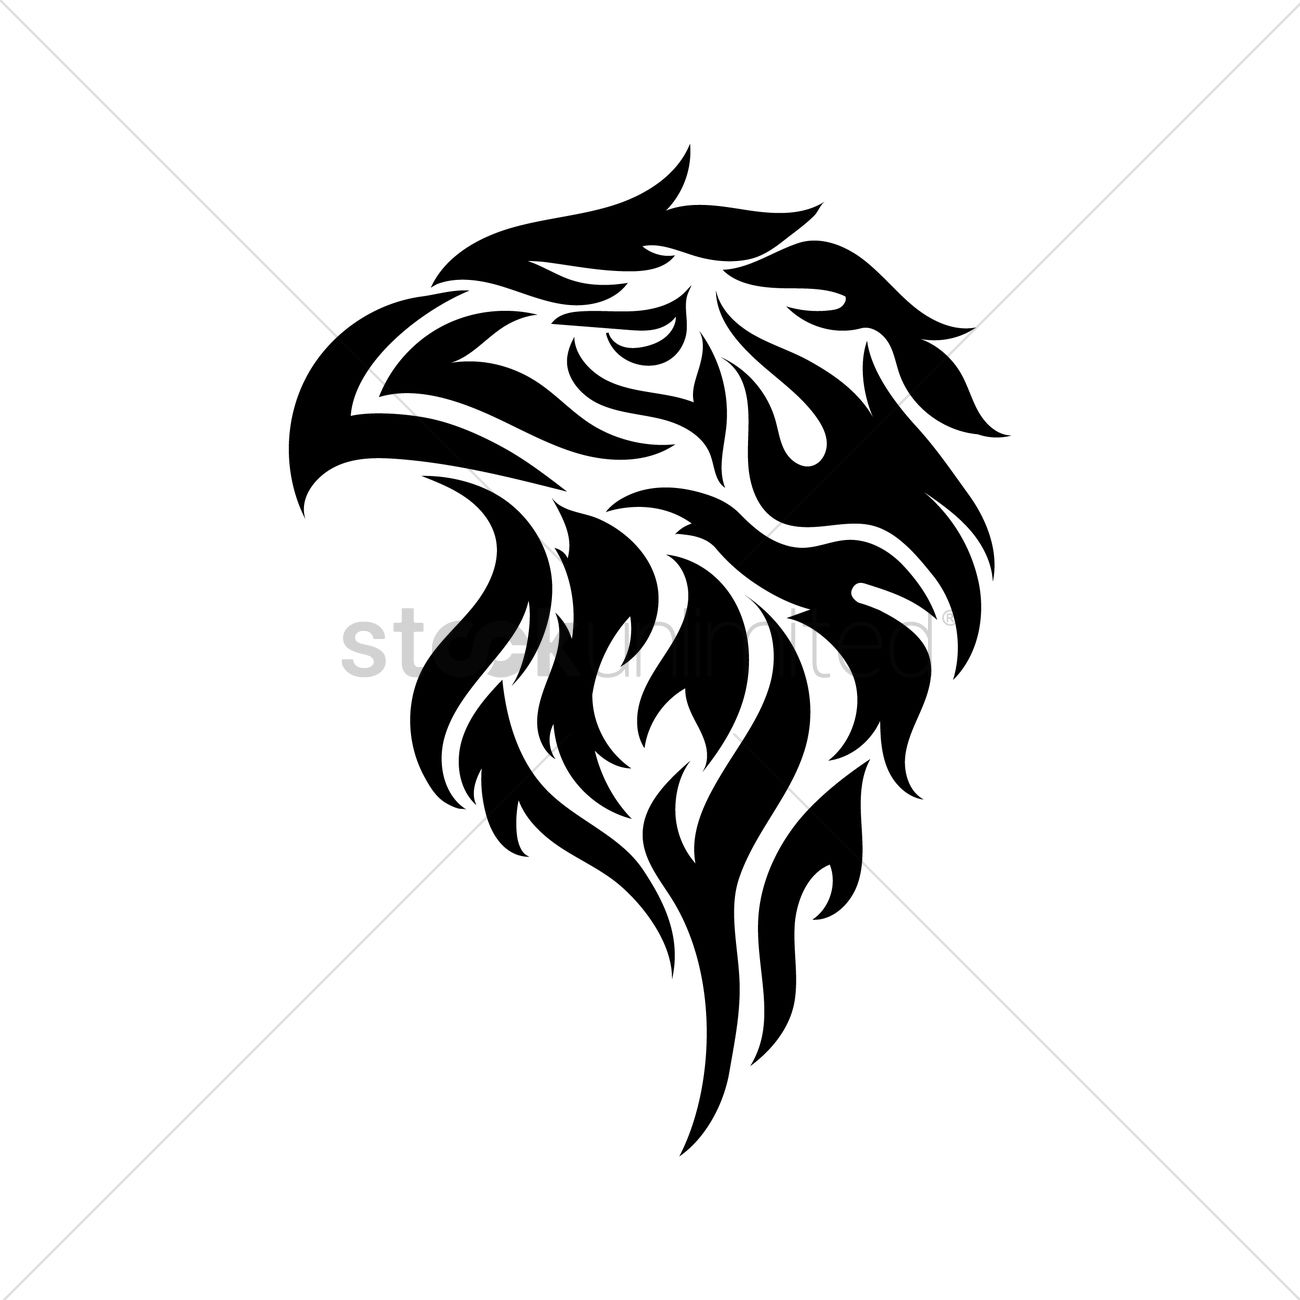 eagle tribal tattoo vector image 1480245 stockunlimited. Black Bedroom Furniture Sets. Home Design Ideas